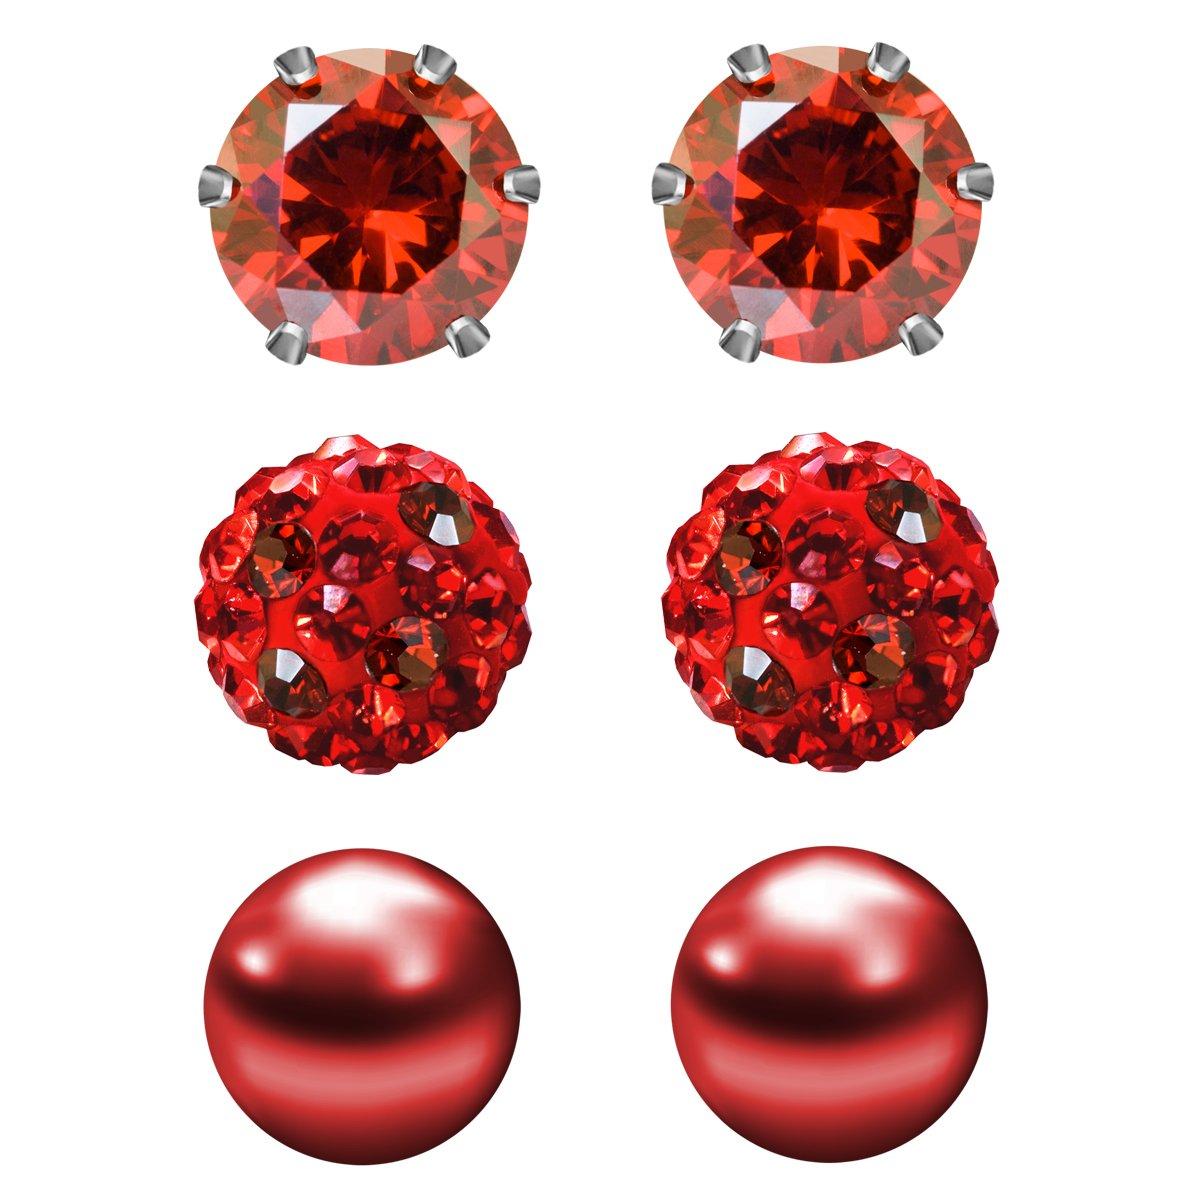 JewelrieShop Cubic Zirconia Rhinestones Crystal Ball Faux Pearl Birthstone Stud Earrings for Women Girls - Hypoallergenic Stainless Steel Earrings - 3 Pairs 1305-130-M01-3P